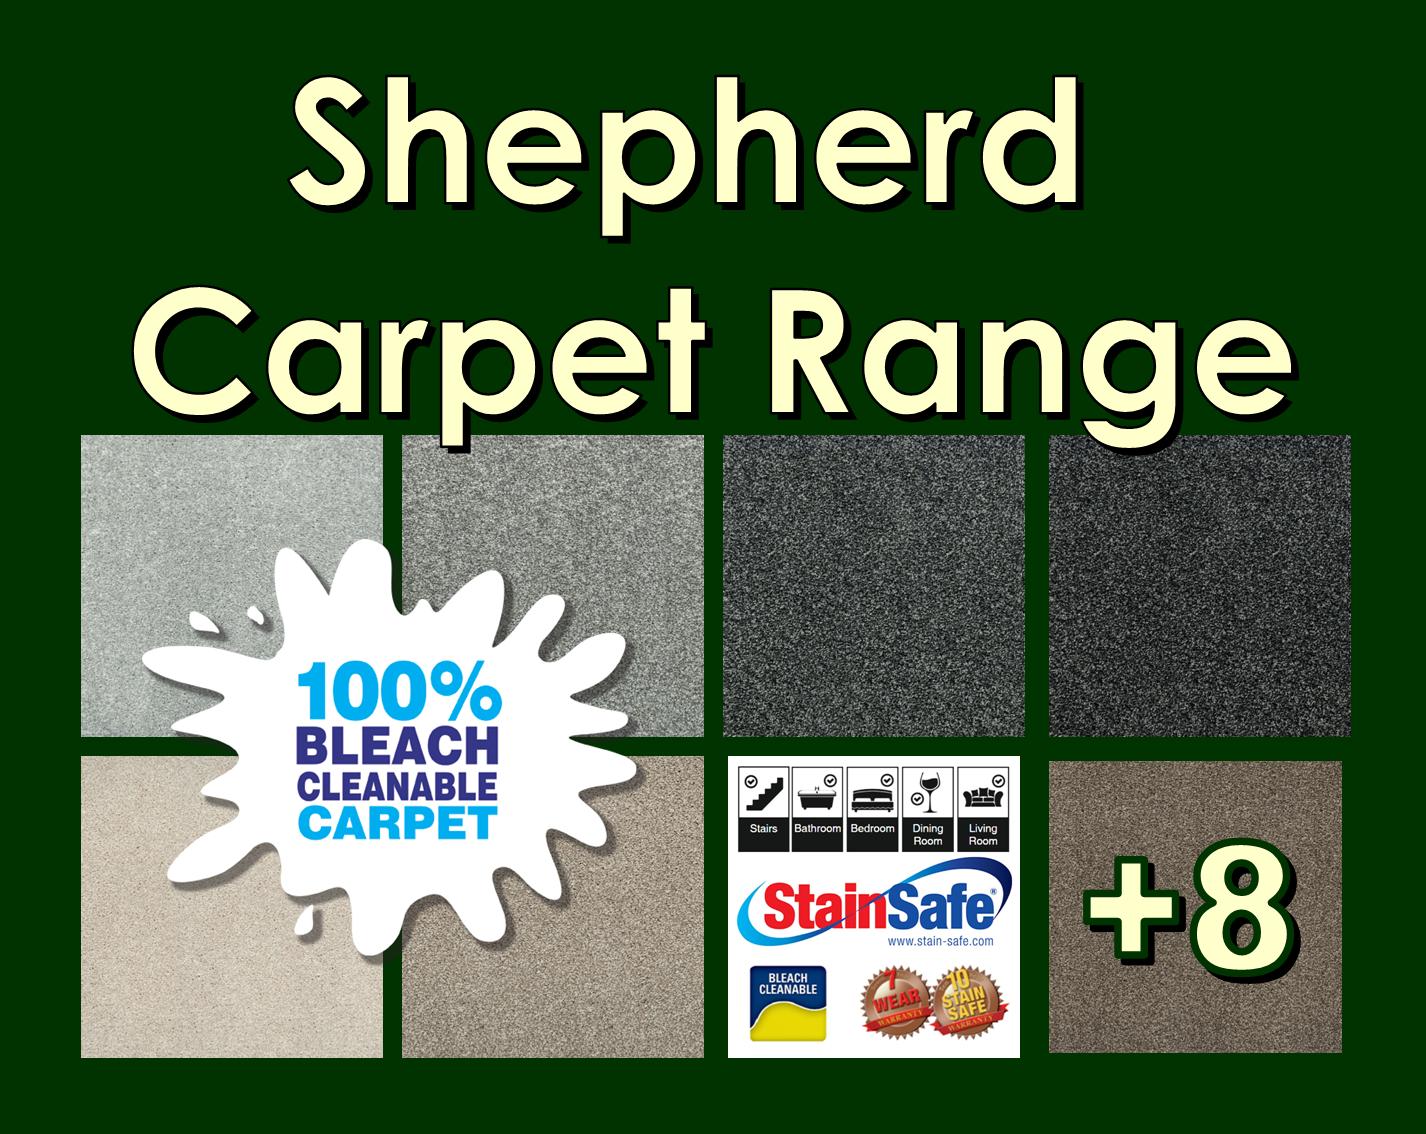 View Shepherd Carpet Range